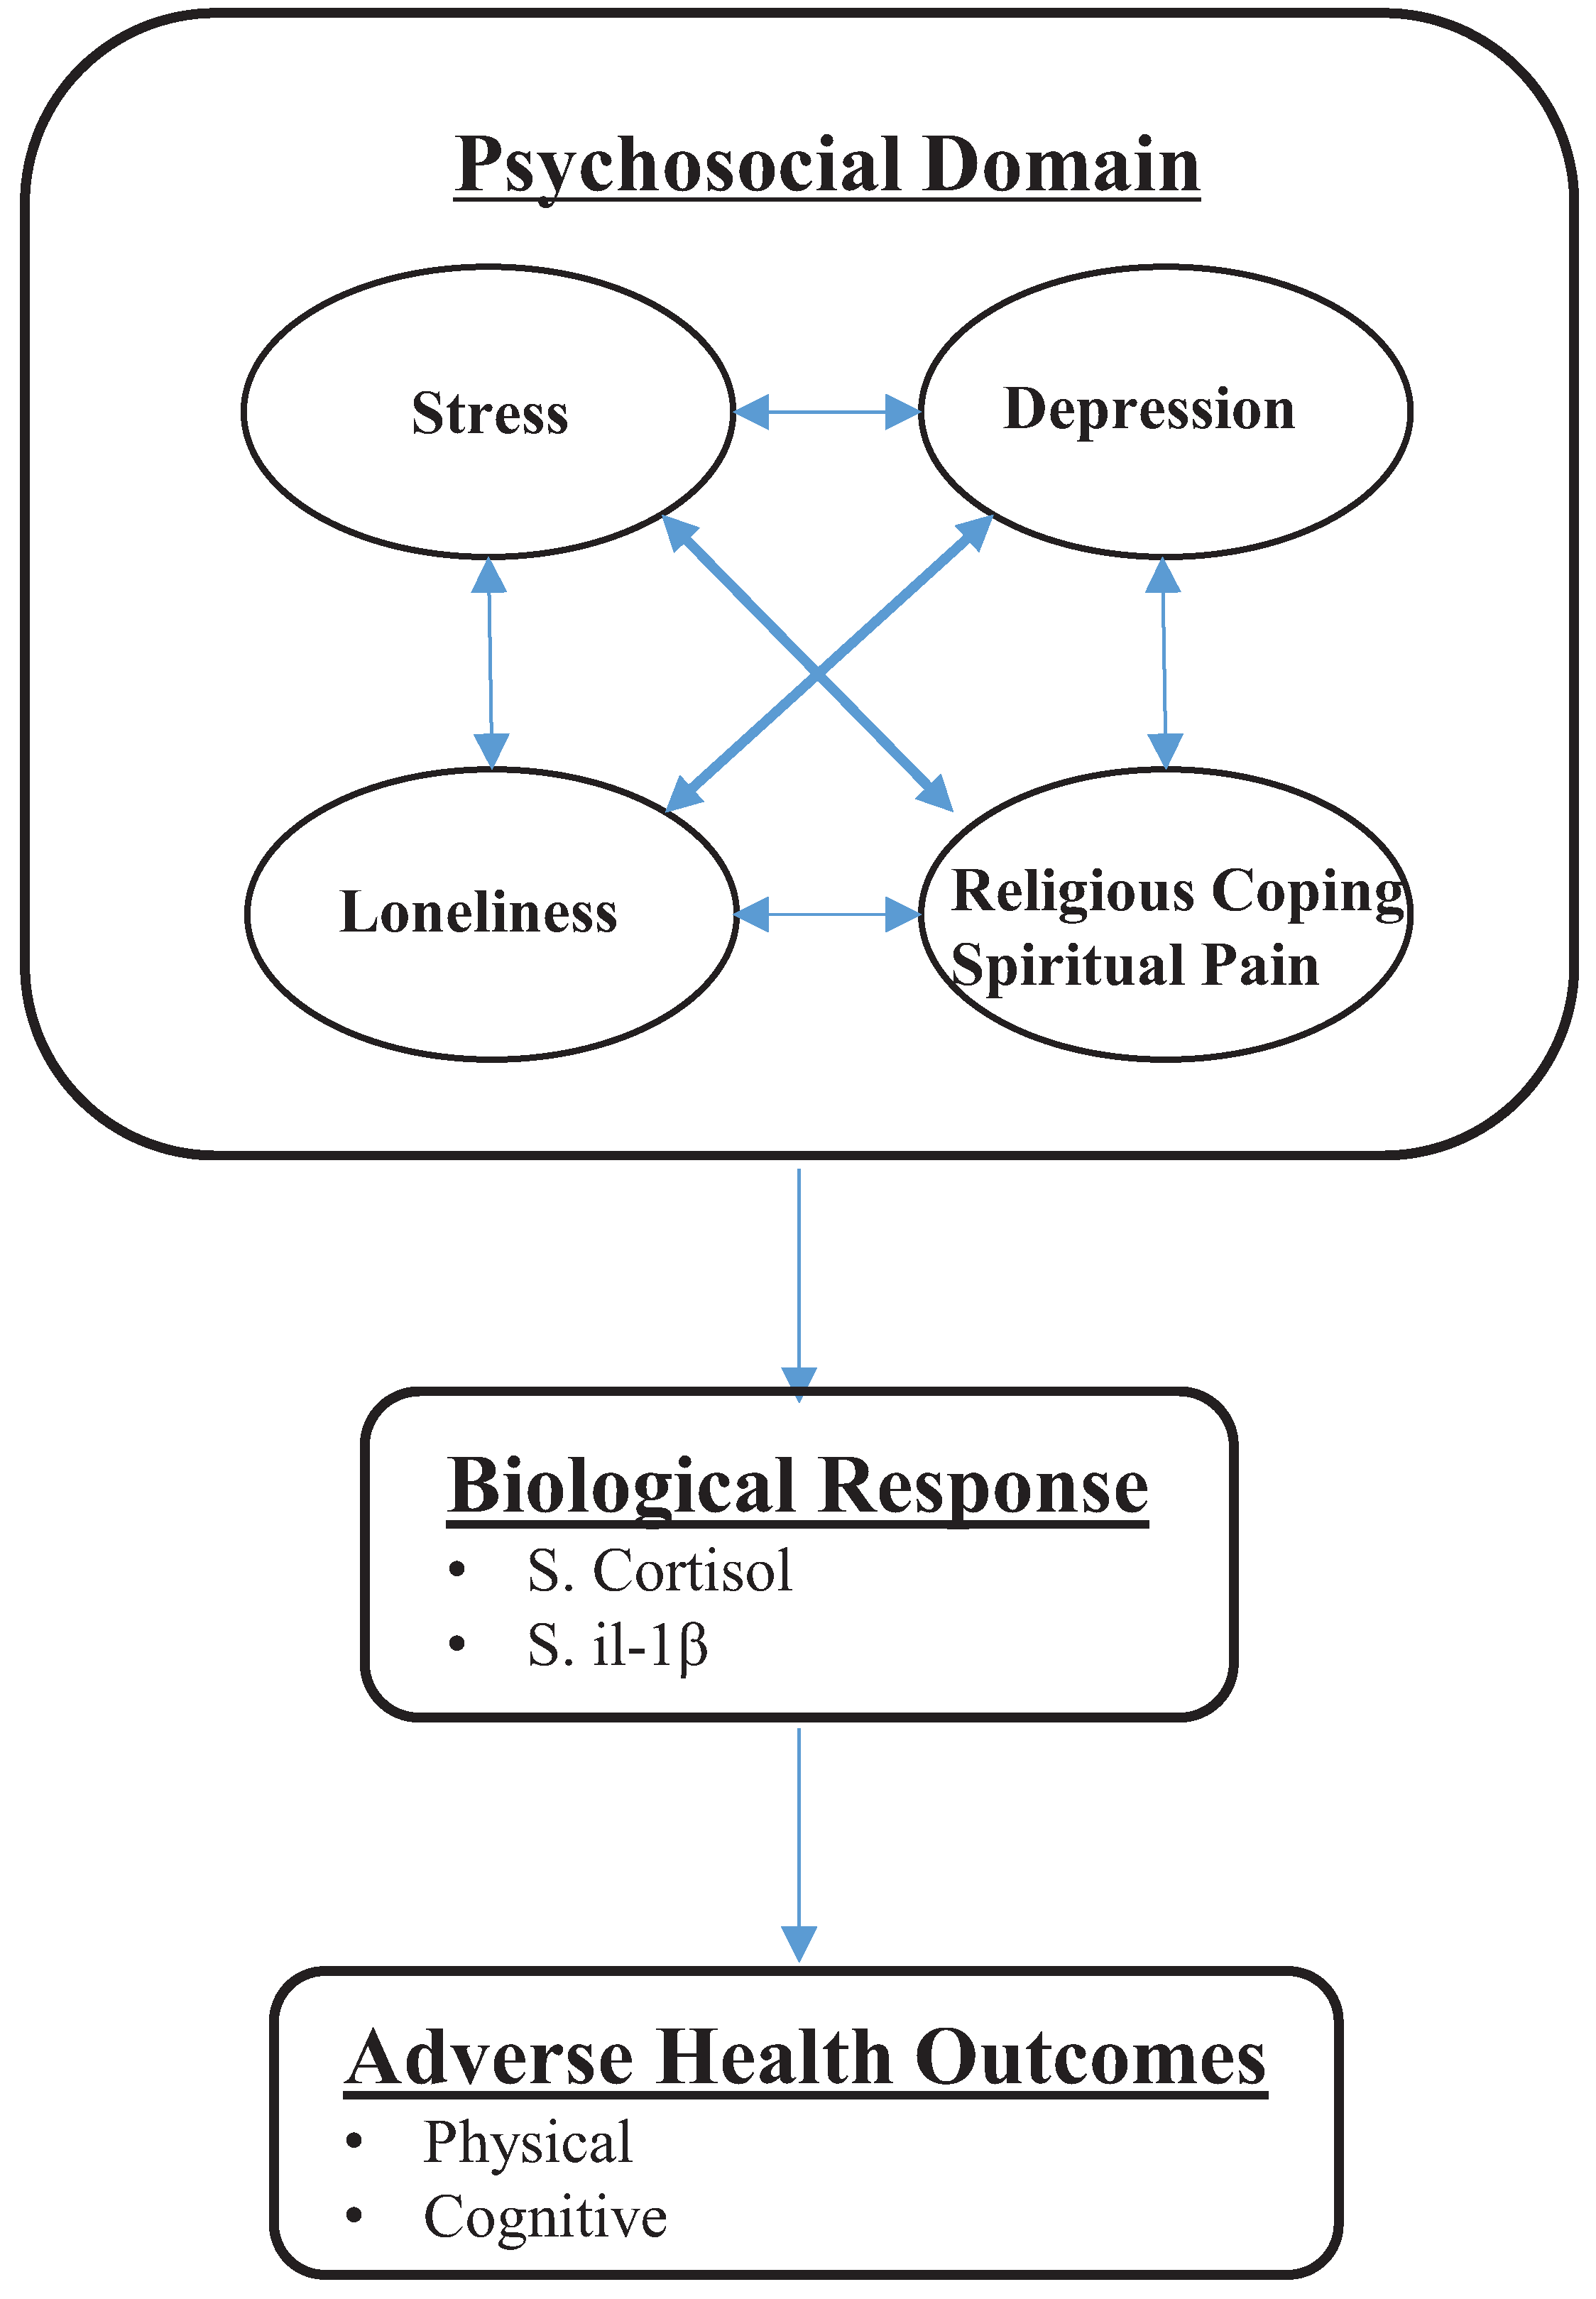 Wiring Diagram 1997 Mako 243 Electricity Basics 101 1978 Mercruiser Healthcare Free Full Text Spiritual Pain In Meals On Wheels Rh Mdpi Com Trim Sender